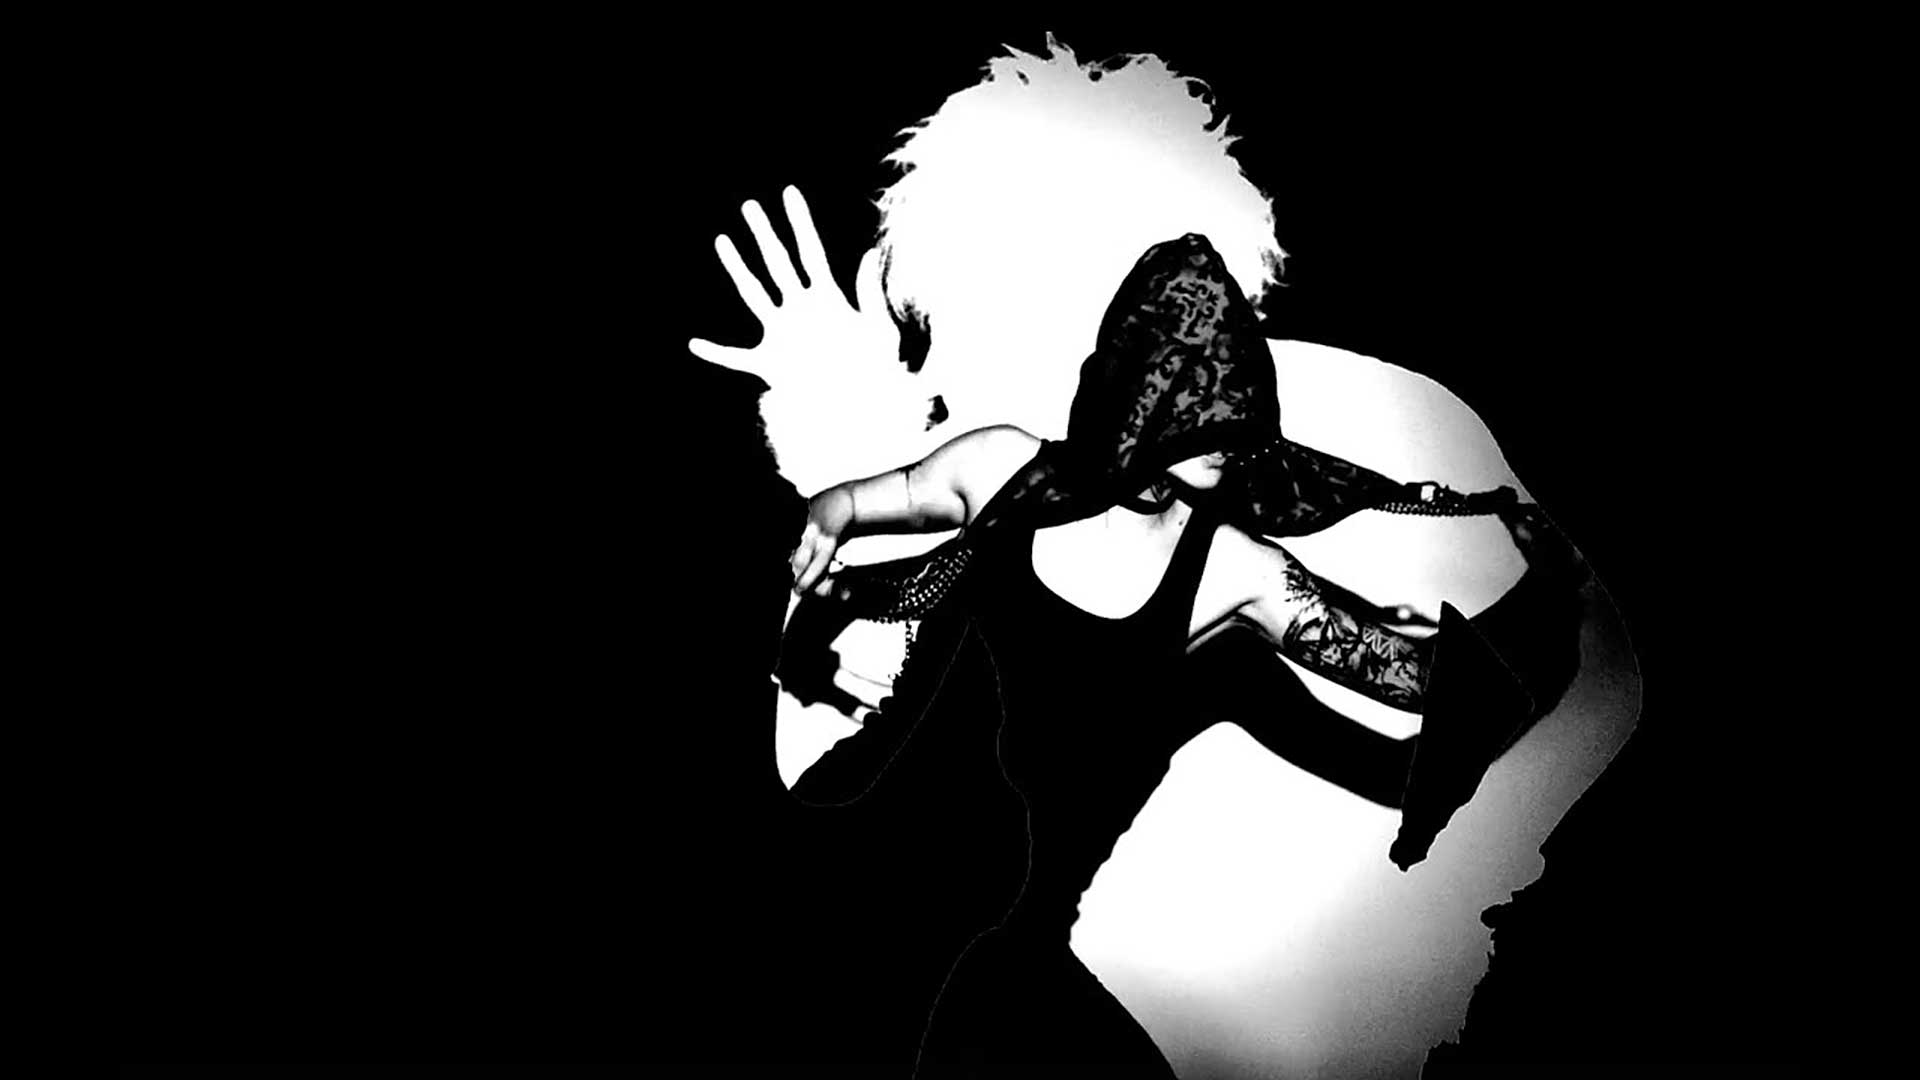 I Ya Toyah - It's No Good (Depeche Mode Cover)